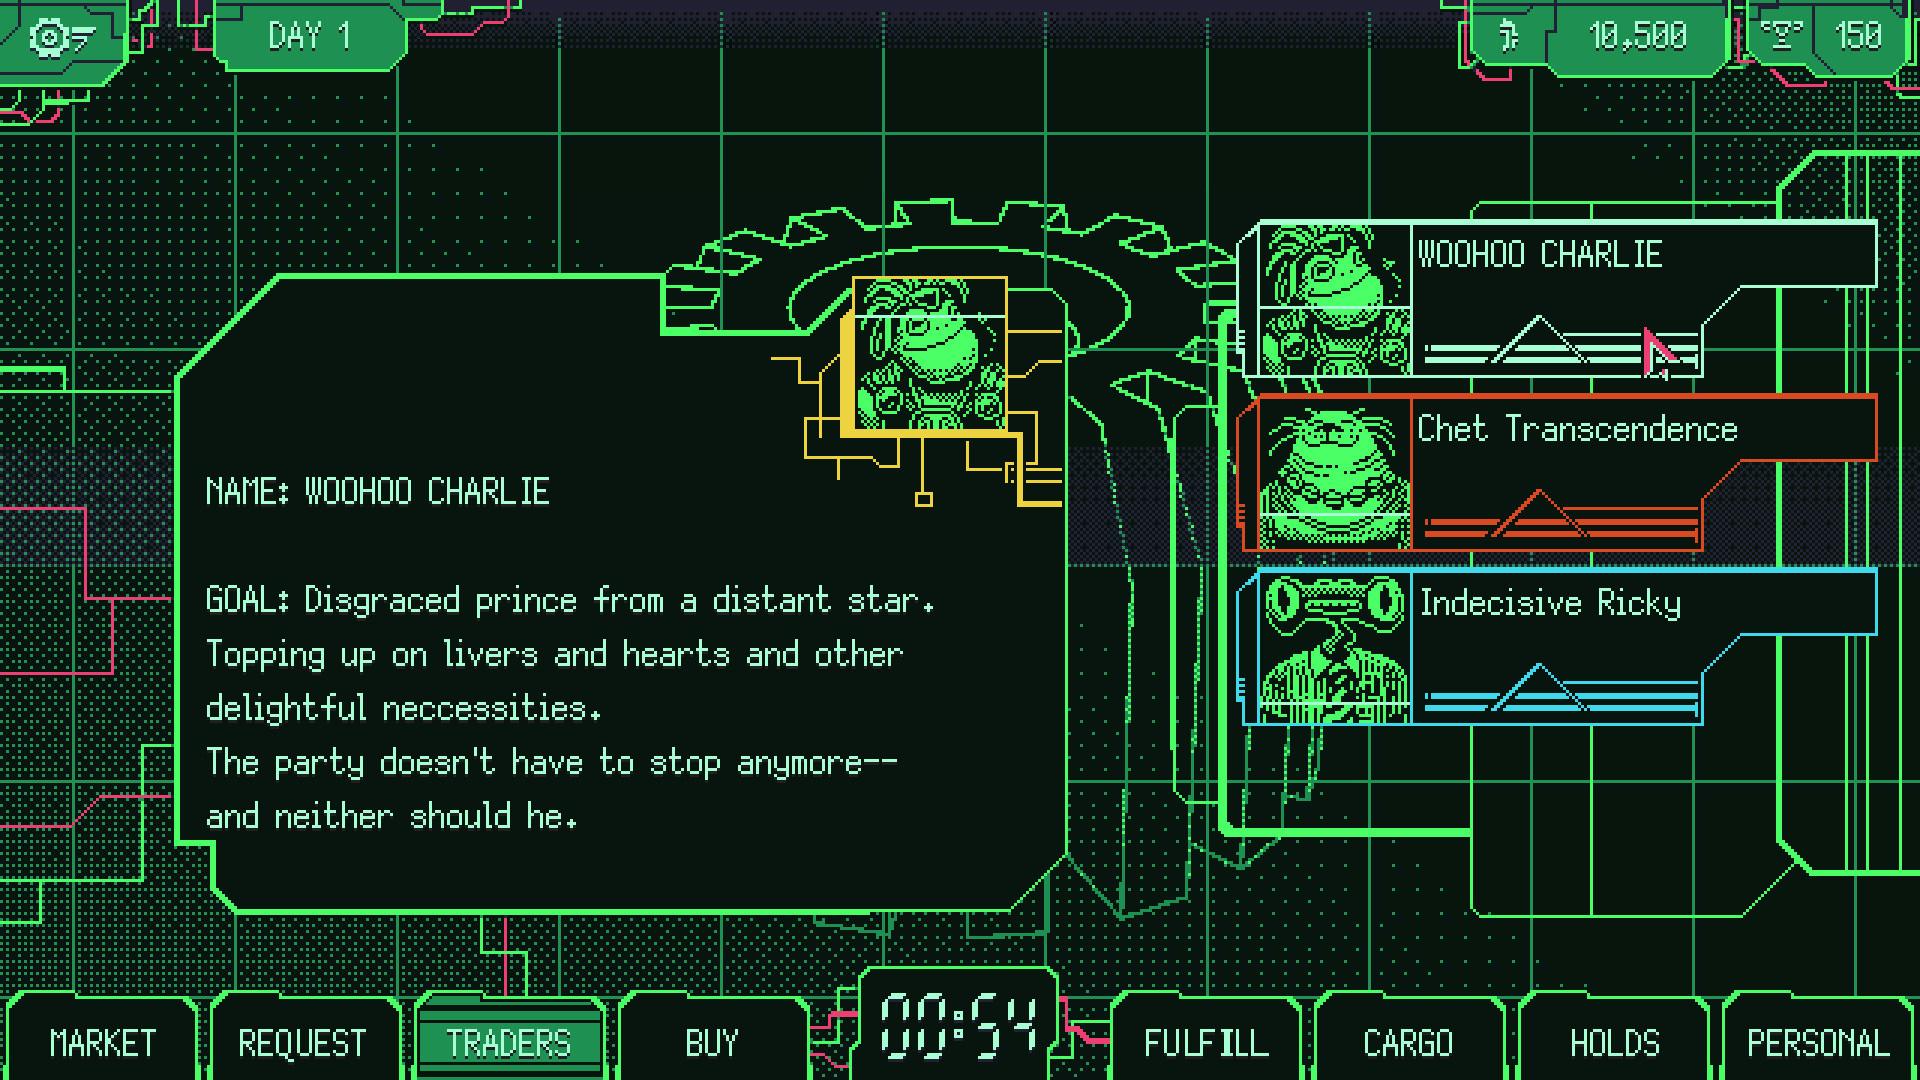 Space Warlord Organ Trading Simulator is a fun idea for a video game screenshot